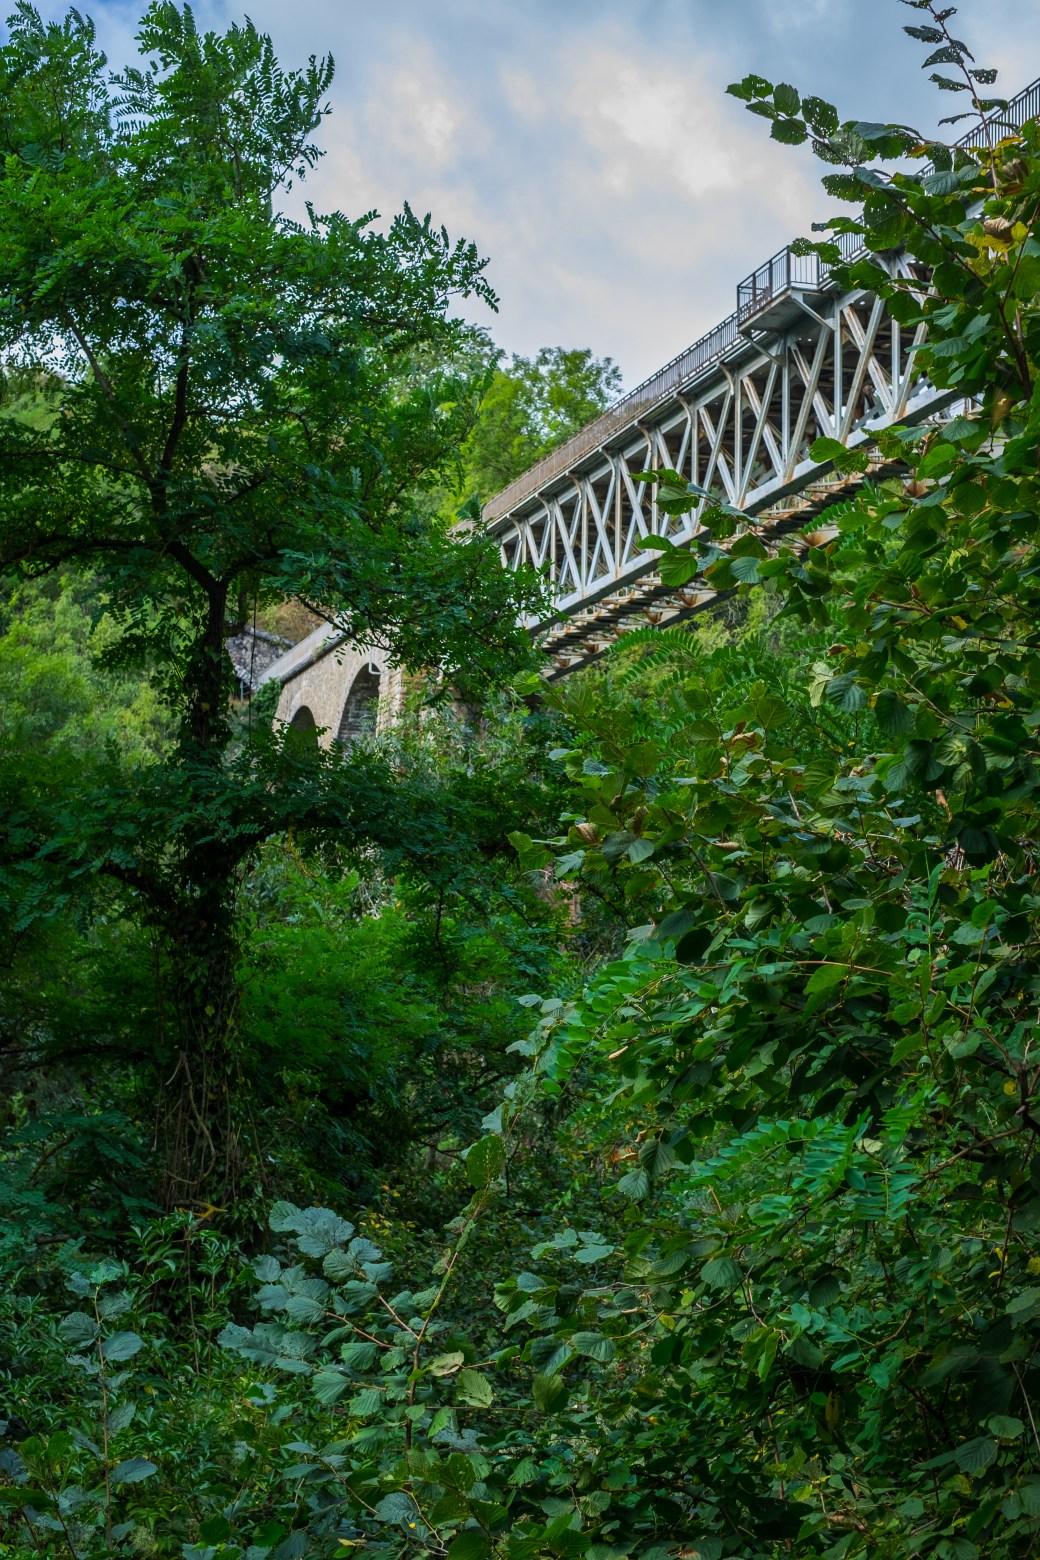 Viaduct de Neuvial